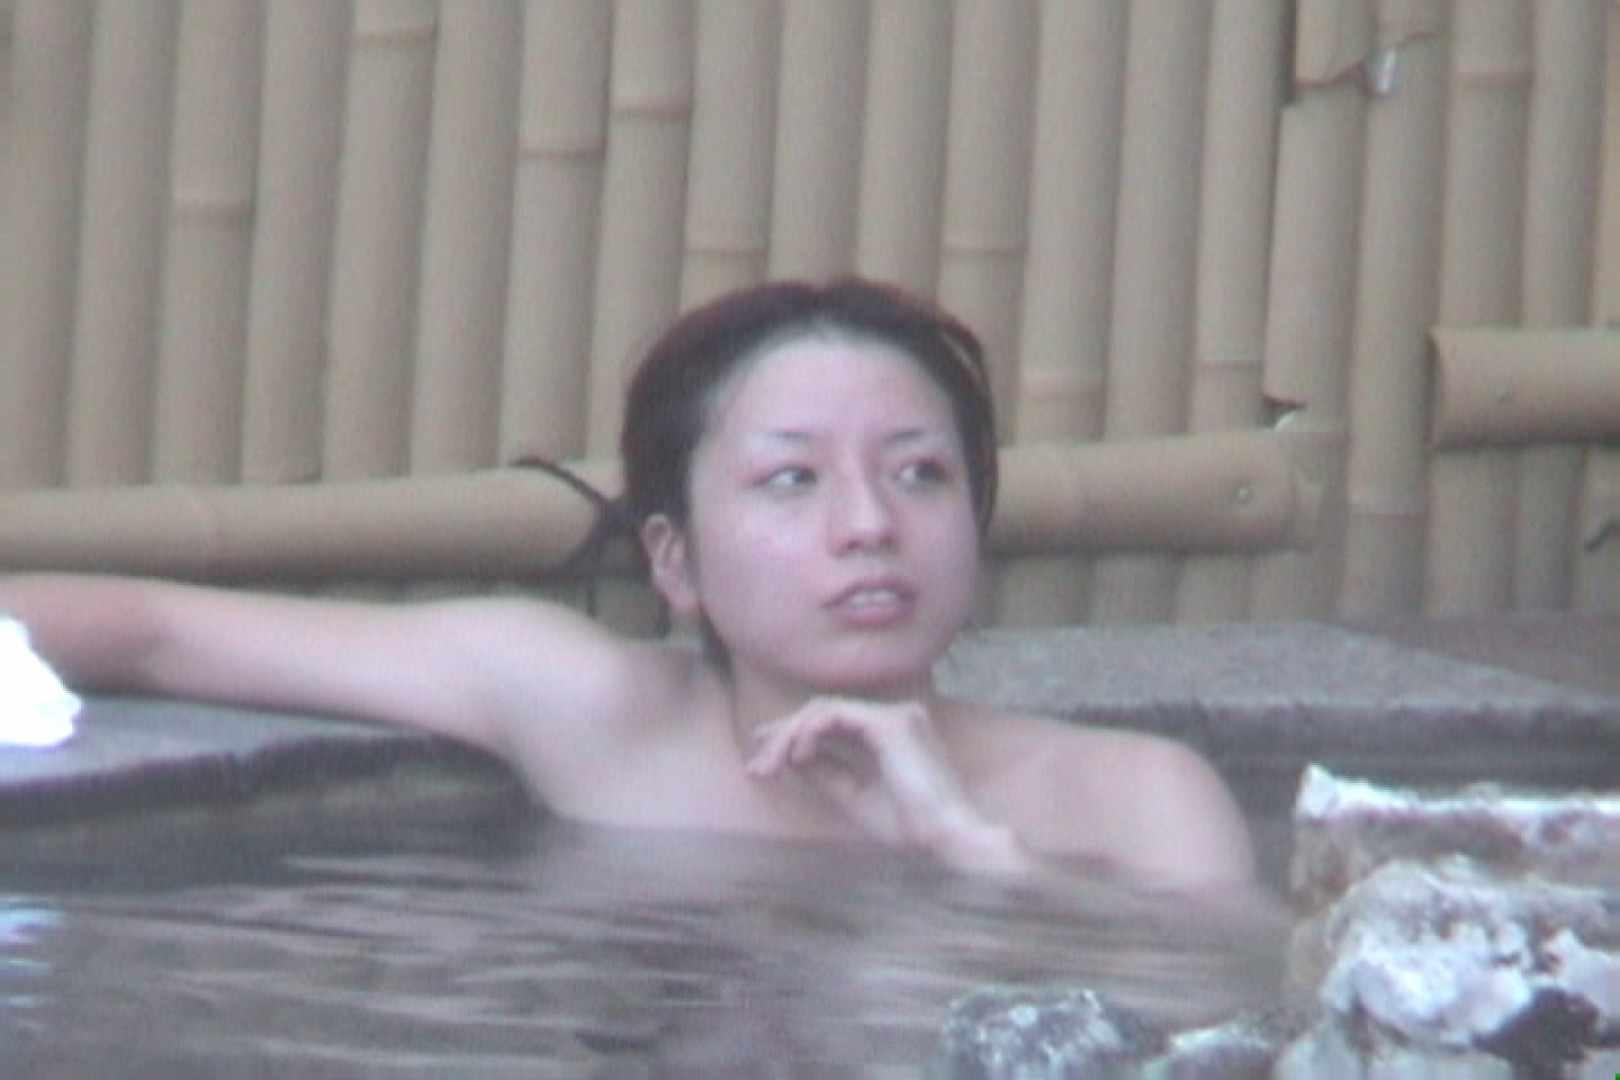 Aquaな露天風呂Vol.608 HなOL | 盗撮  89pic 68